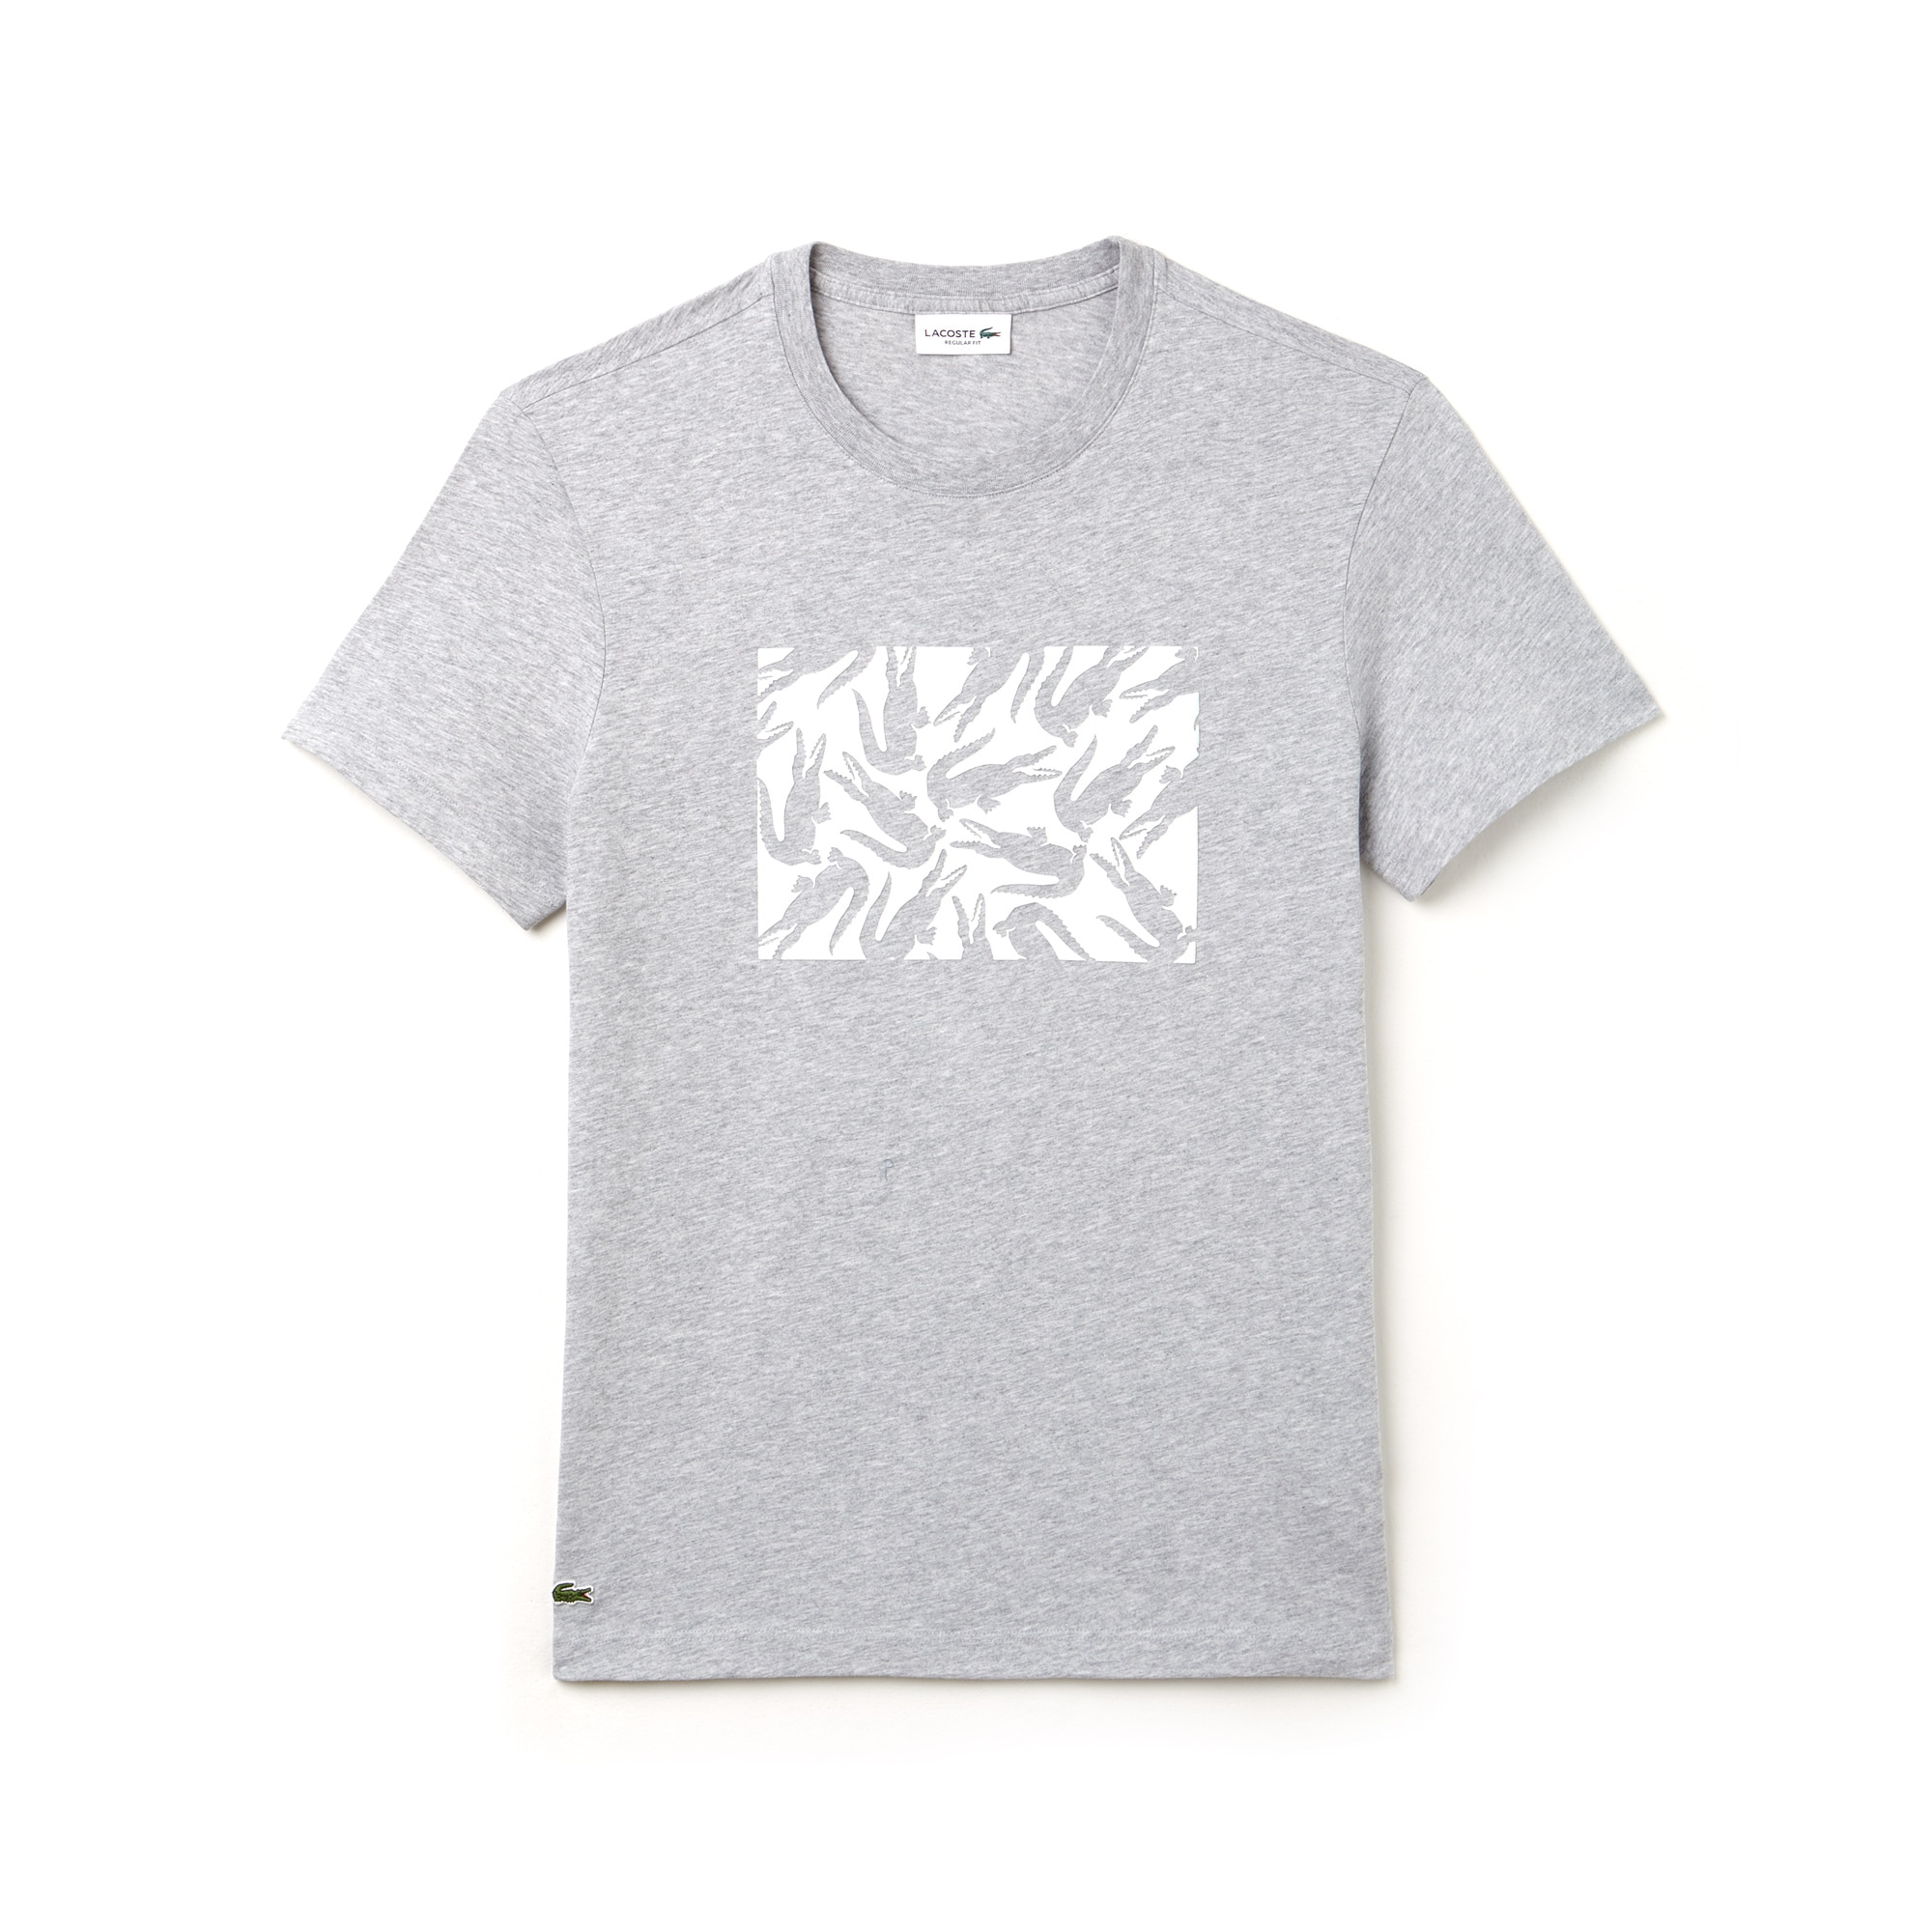 Men's Crew Neck Graphic T-Shirt